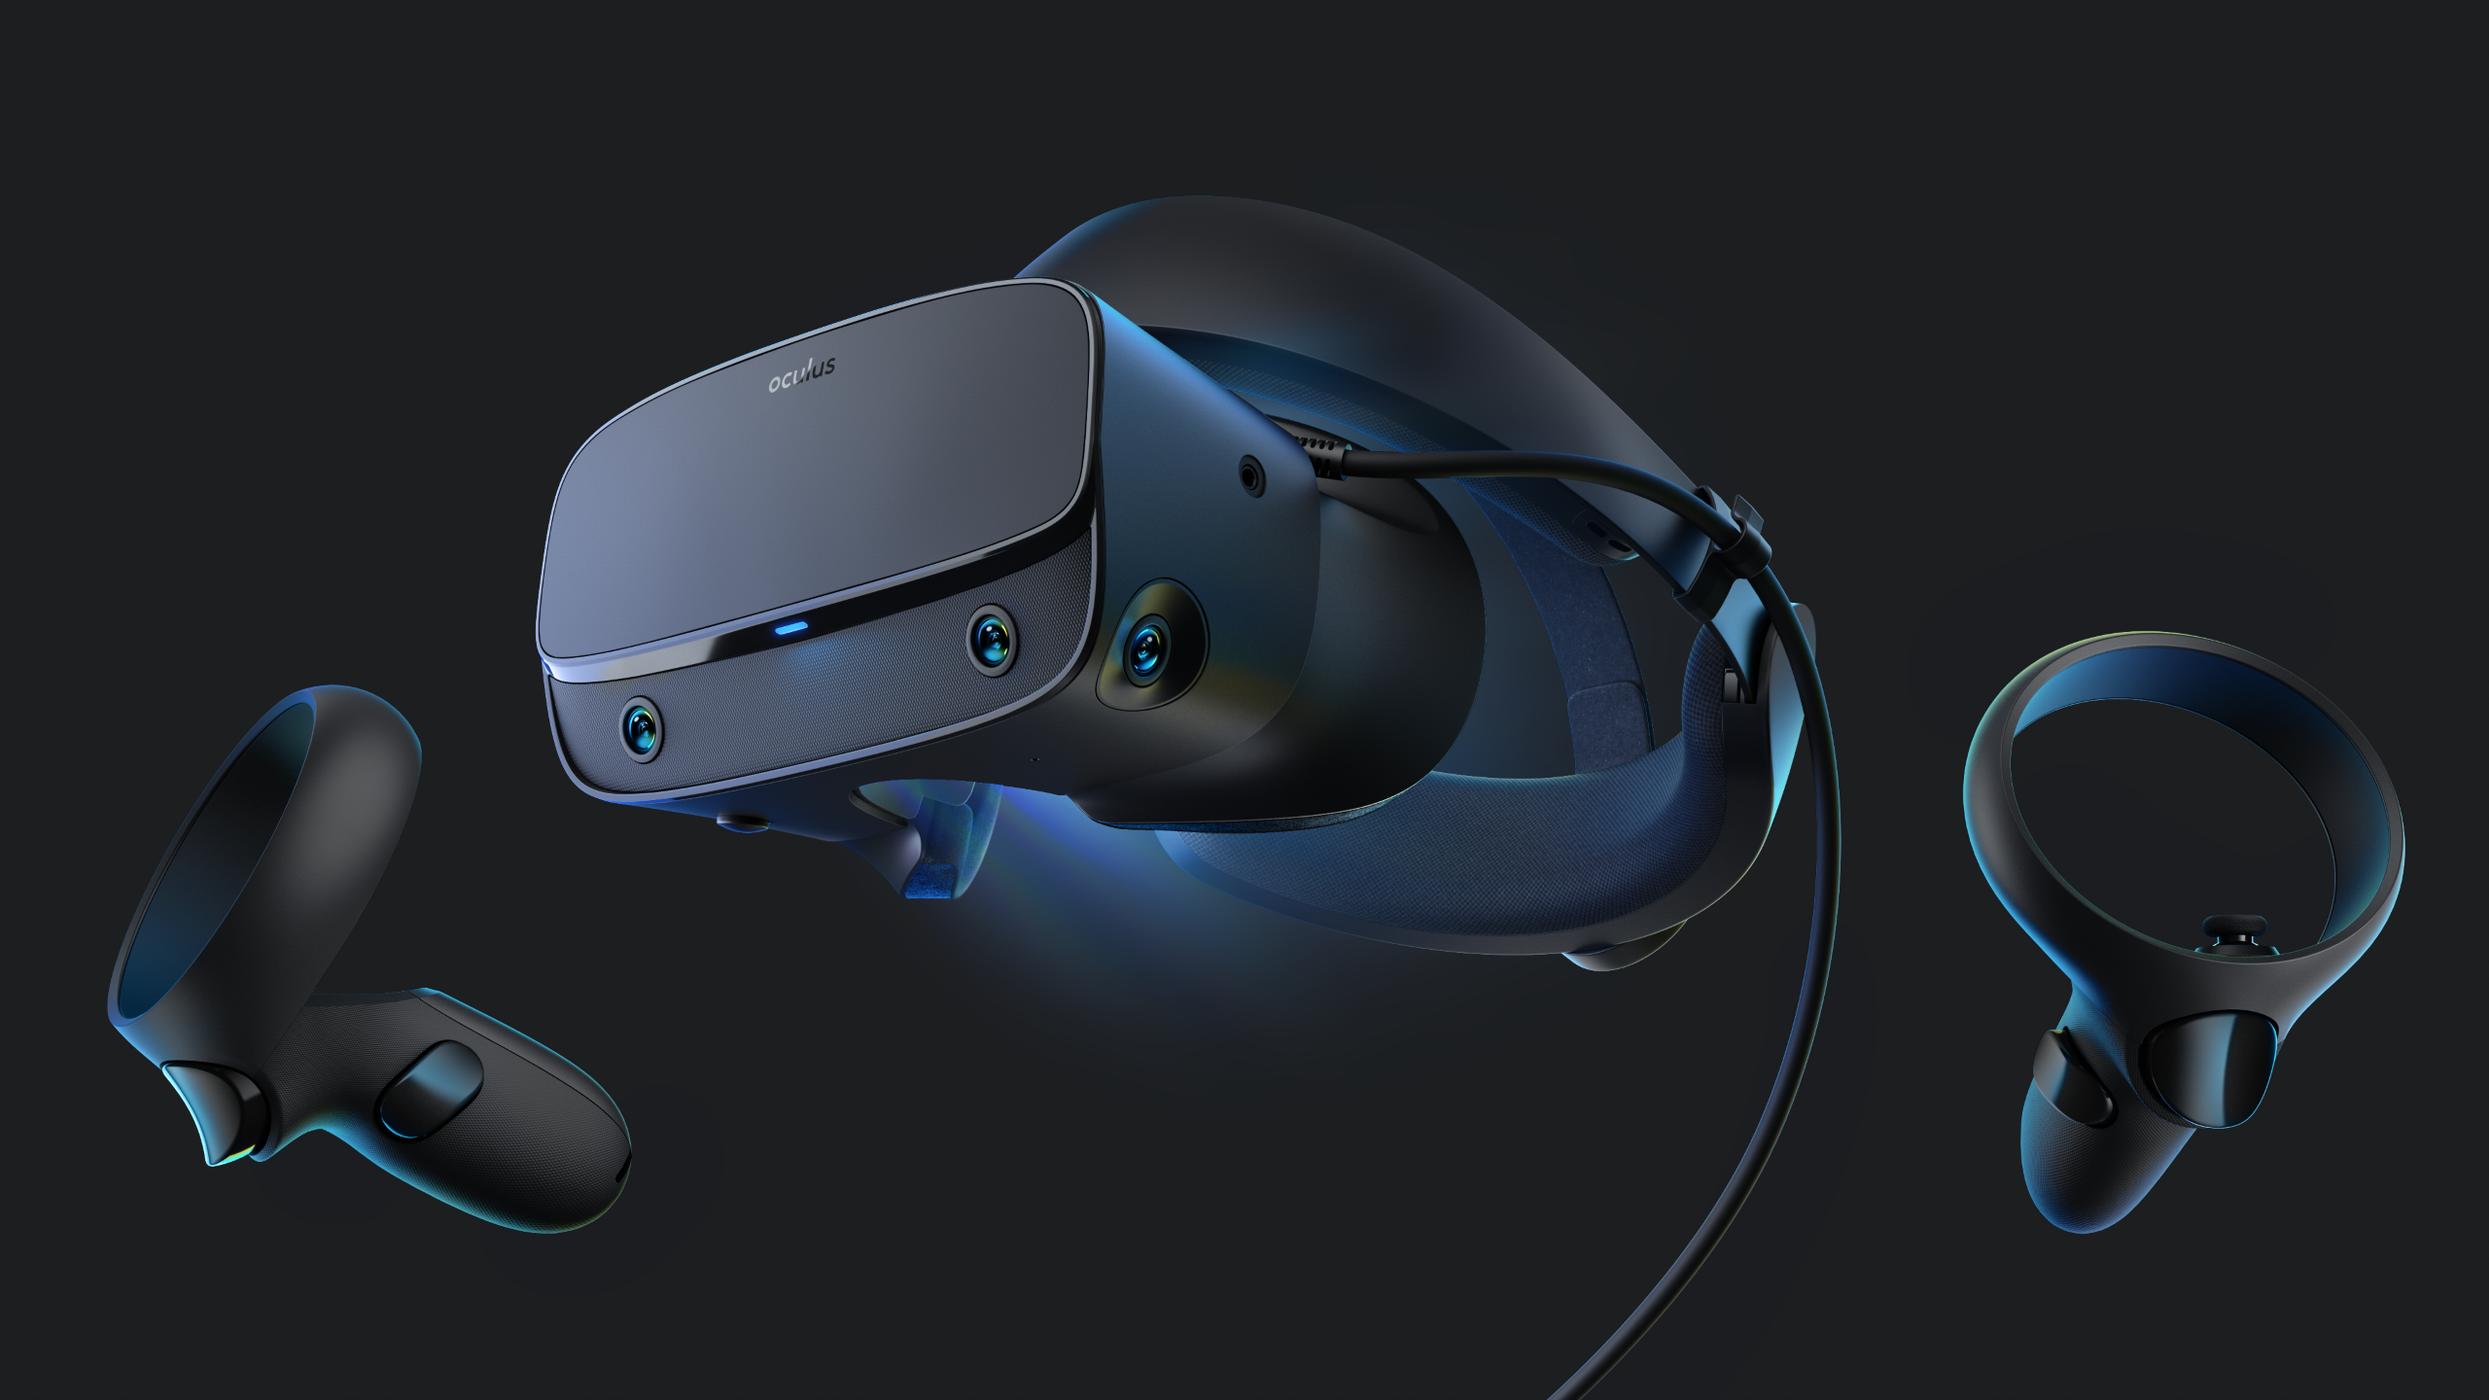 Black Friday Deals Oculus Rift Playstation Vr Htc Vive More Variety